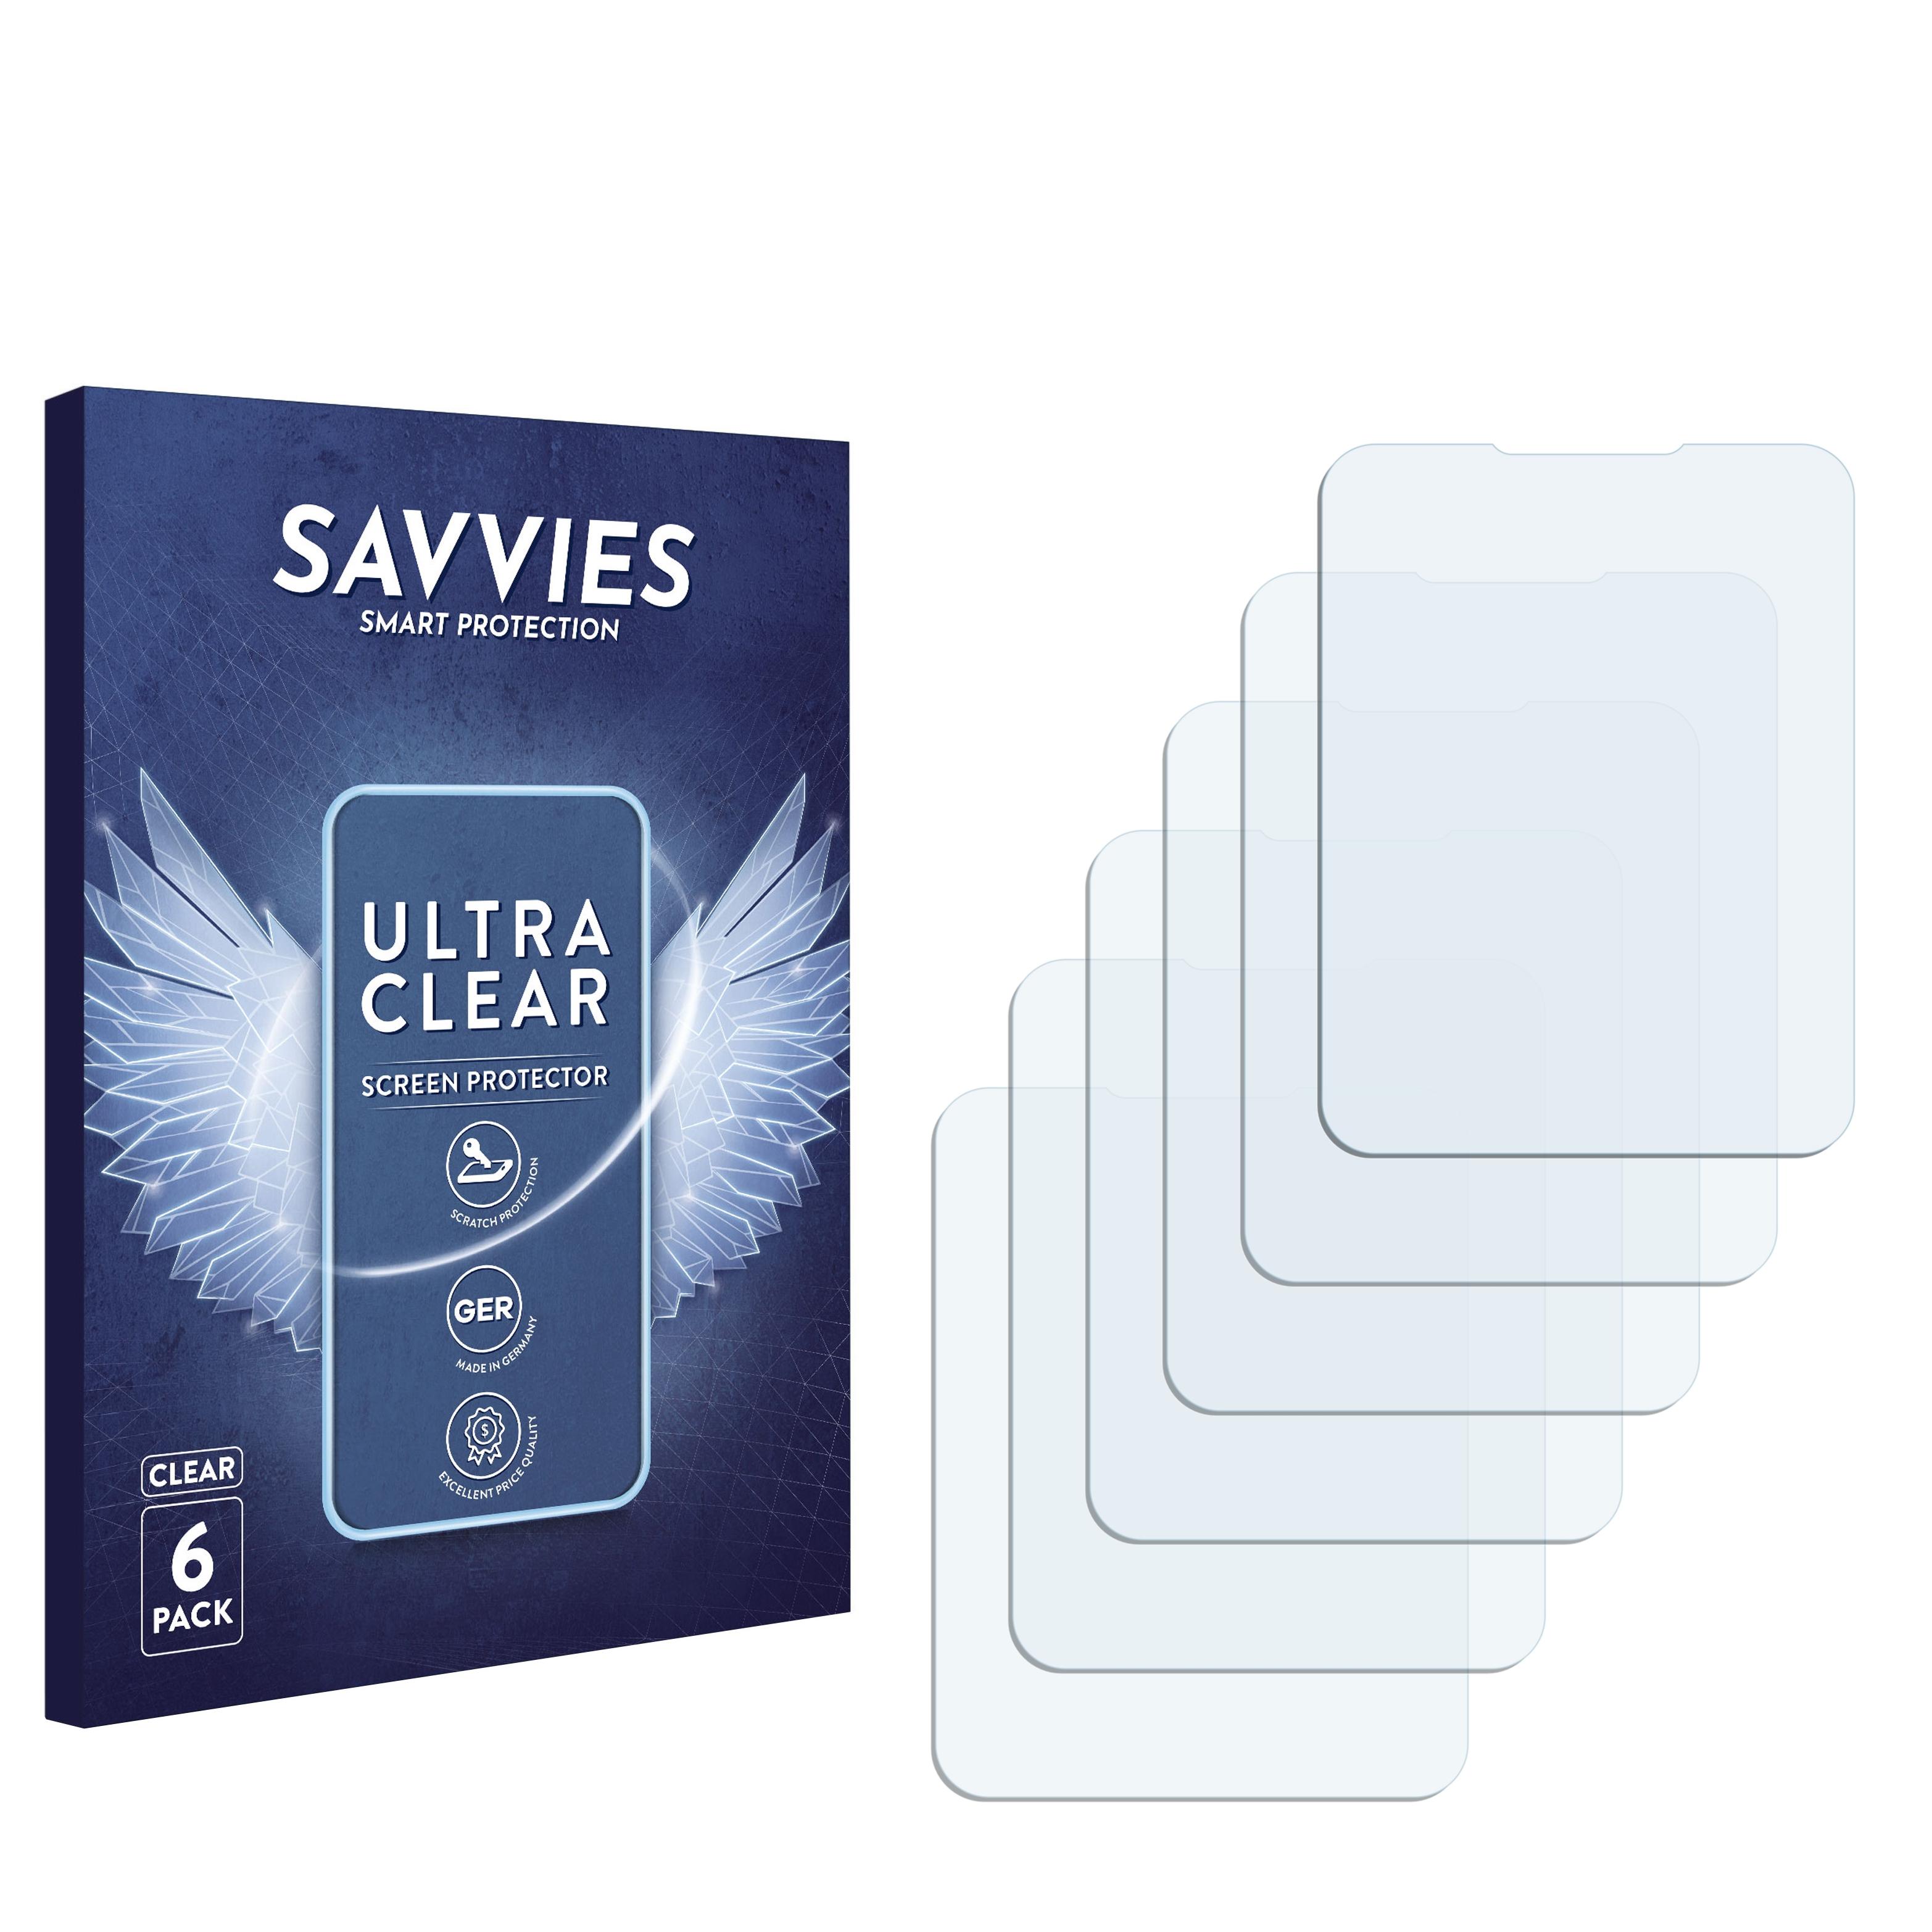 Ochranná fólie Savvies na LG Electronics GB210, 6ks